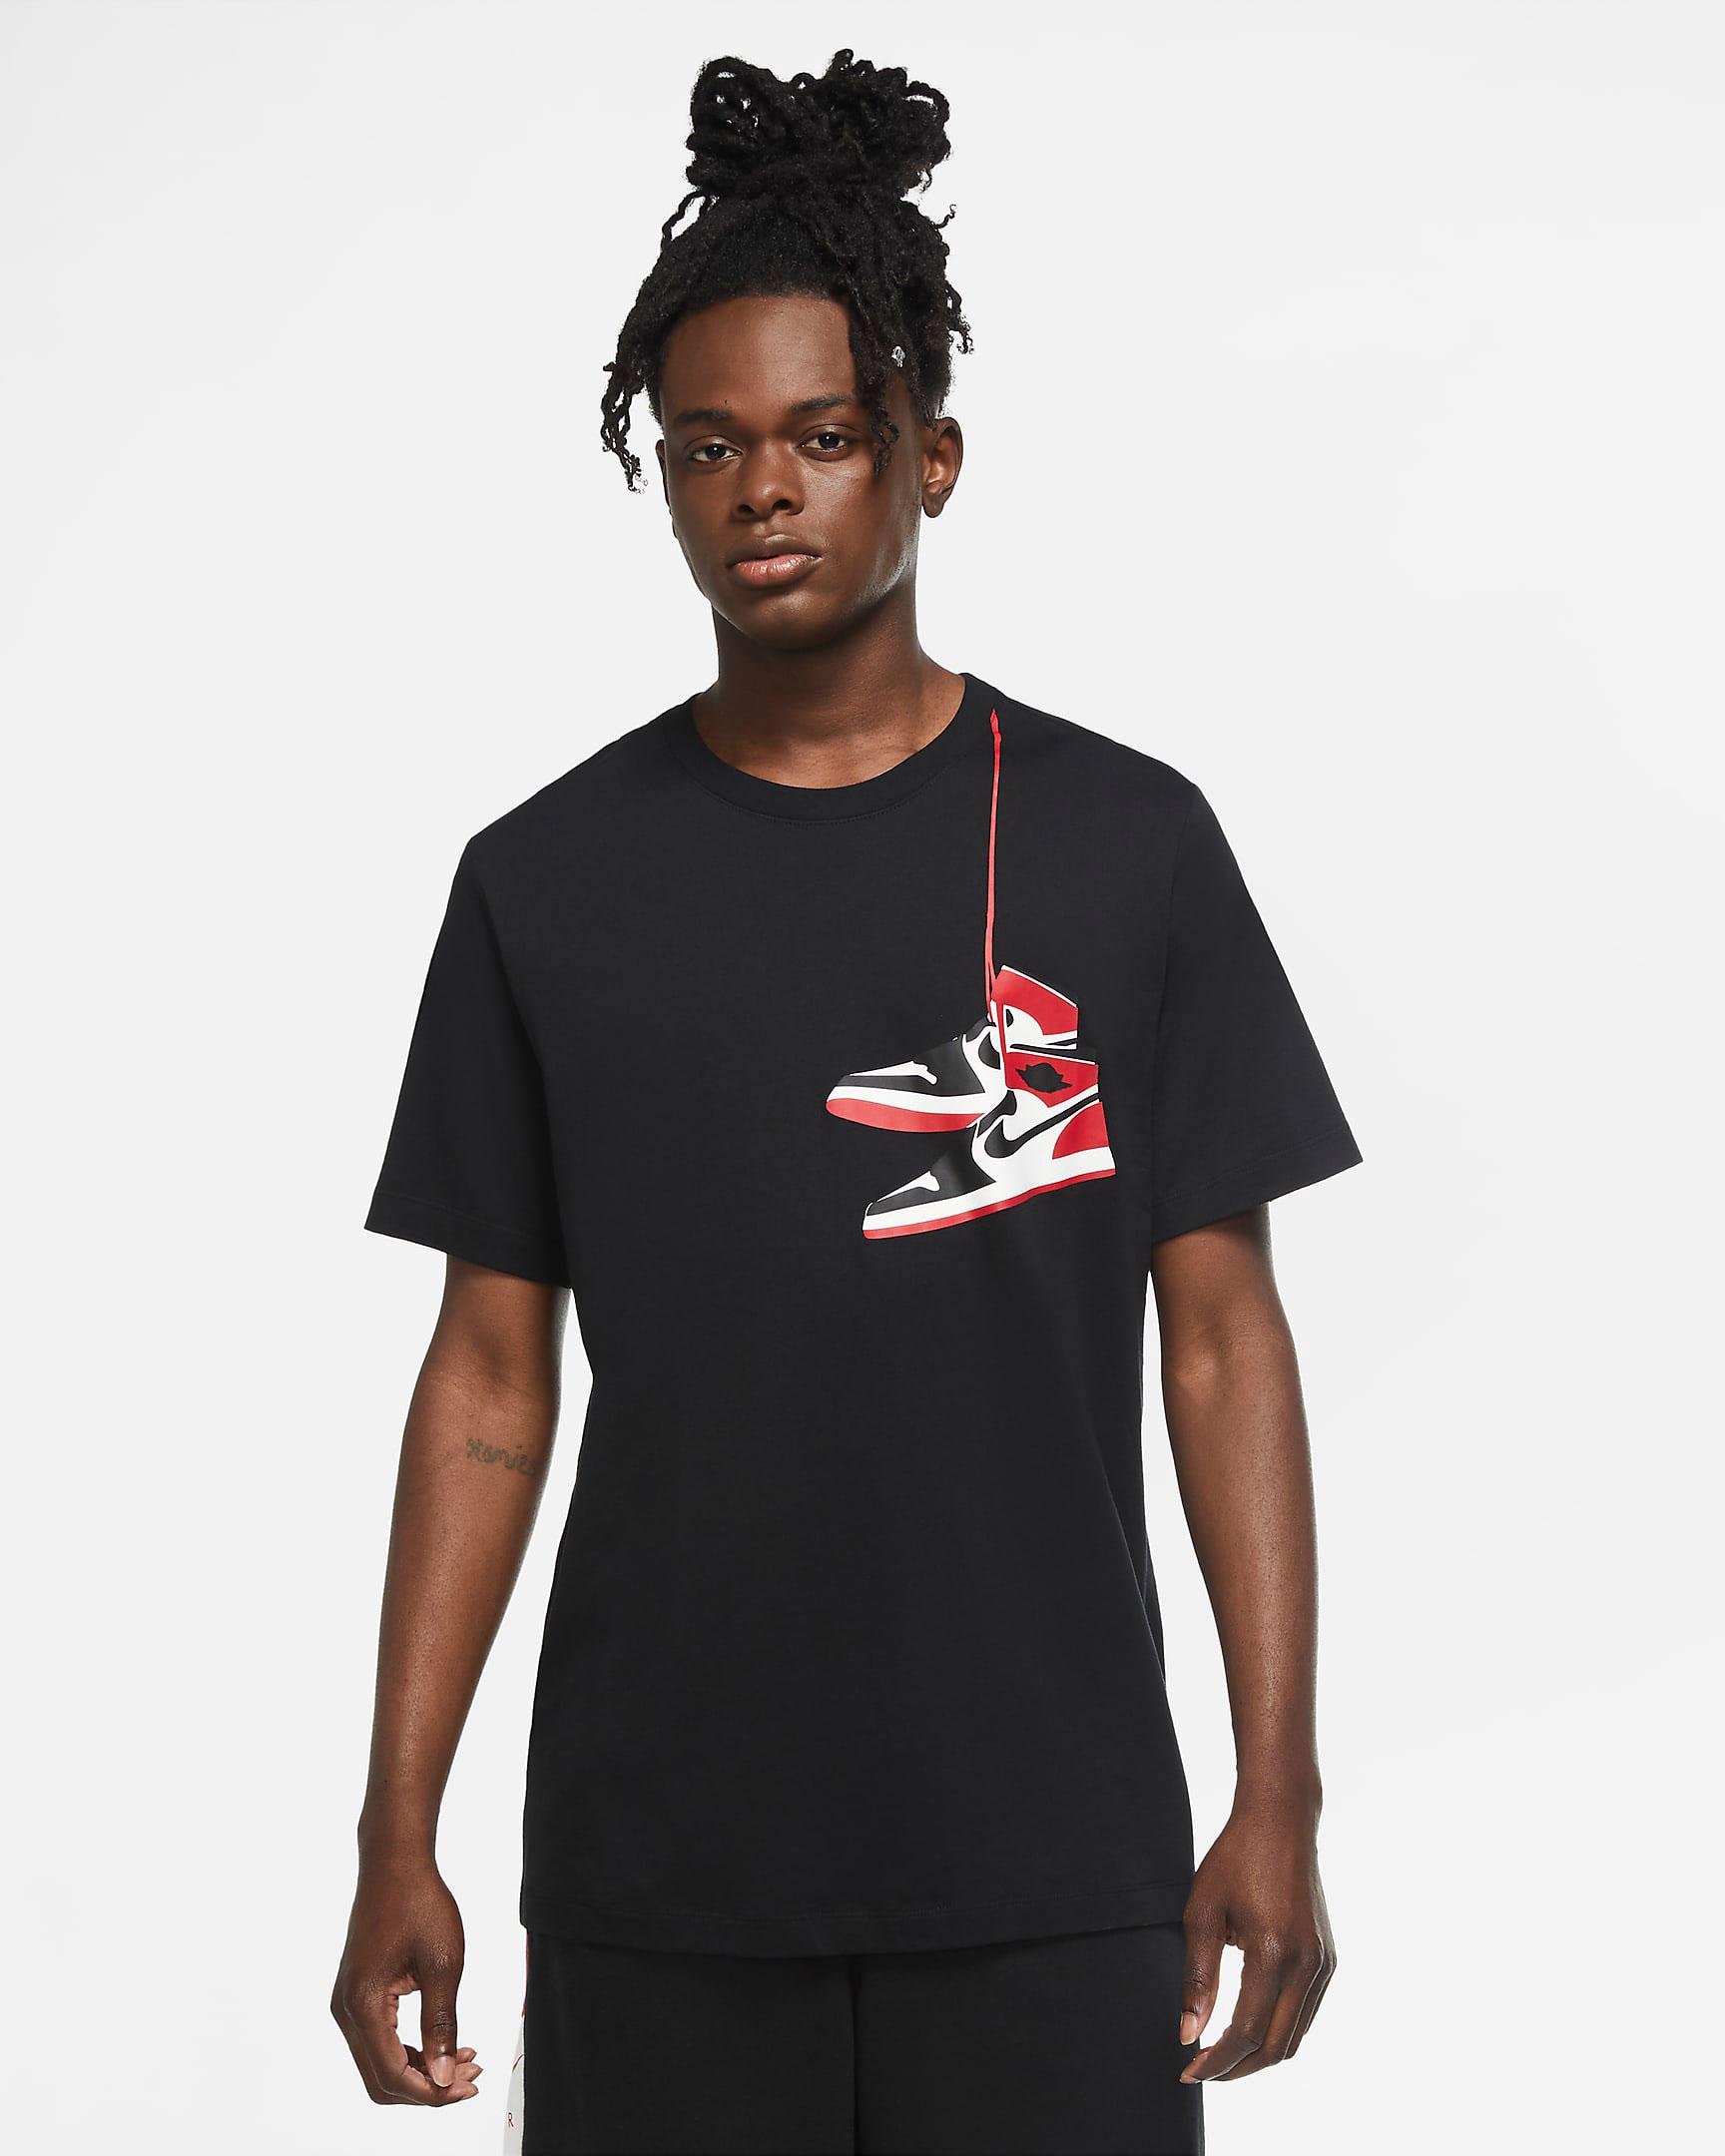 jordan-aj1-knit-stocking-holiday-shirt-black-2